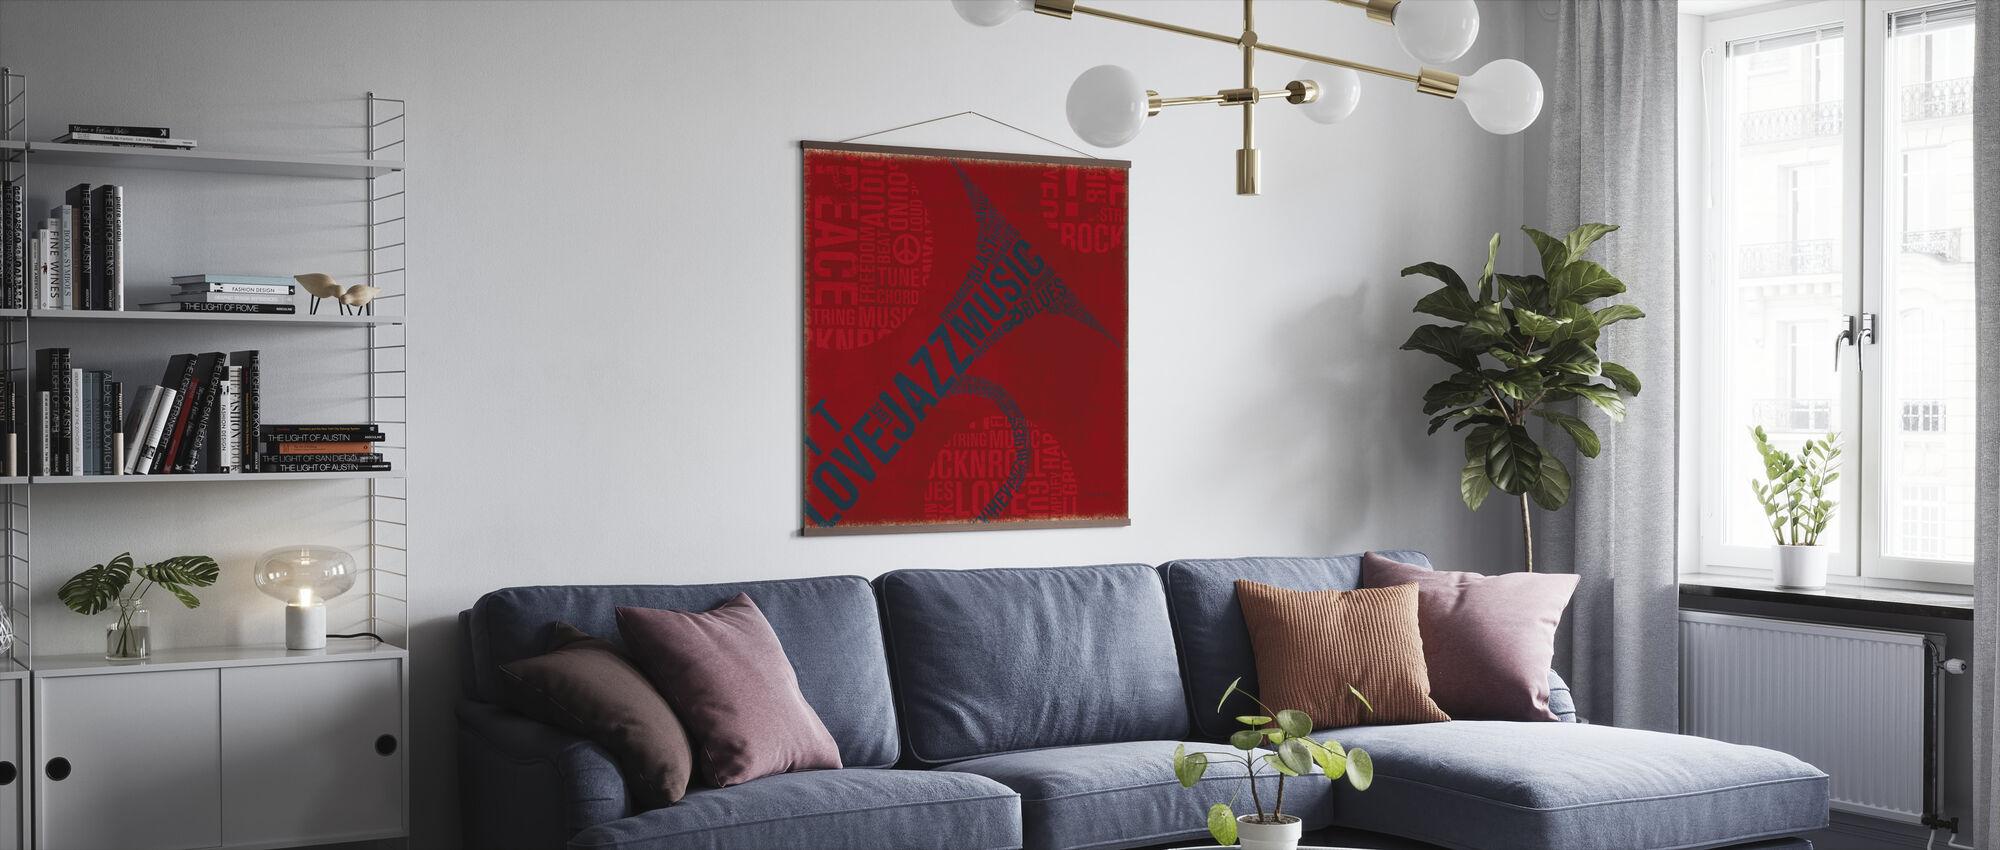 Type Trompet Vierkant - Poster - Woonkamer